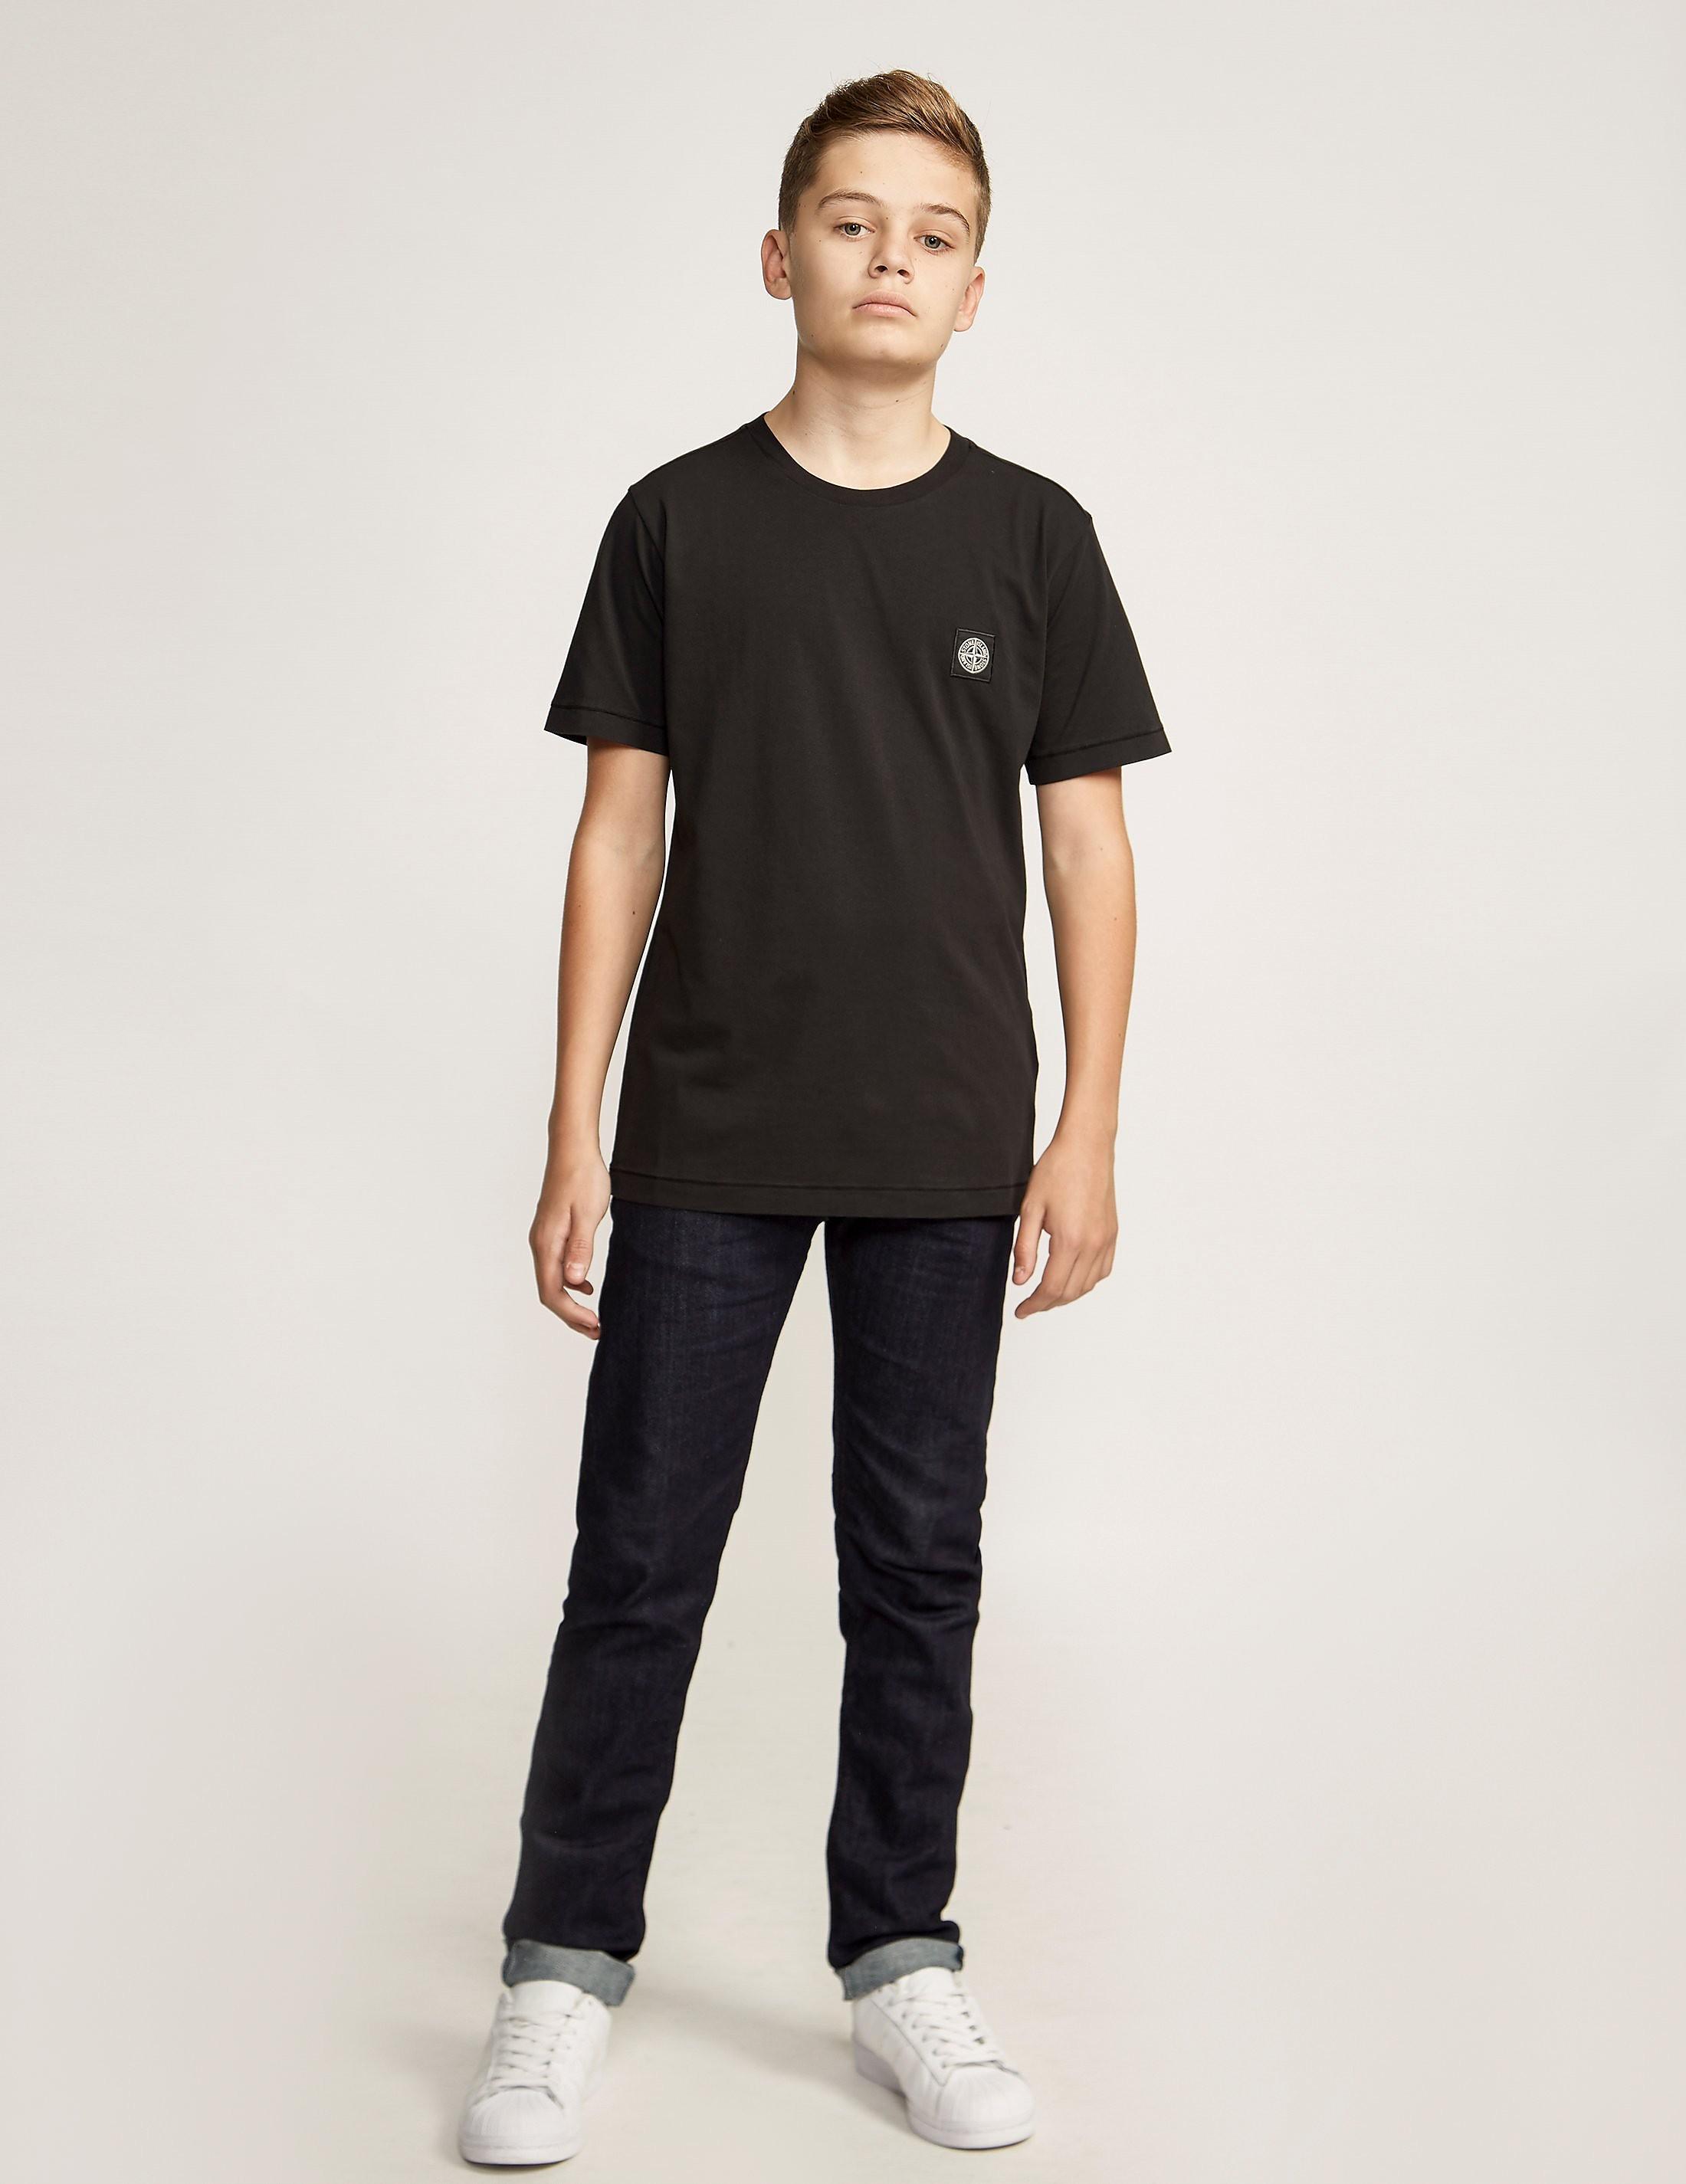 Stone Island Kids' Sik T-Shirt